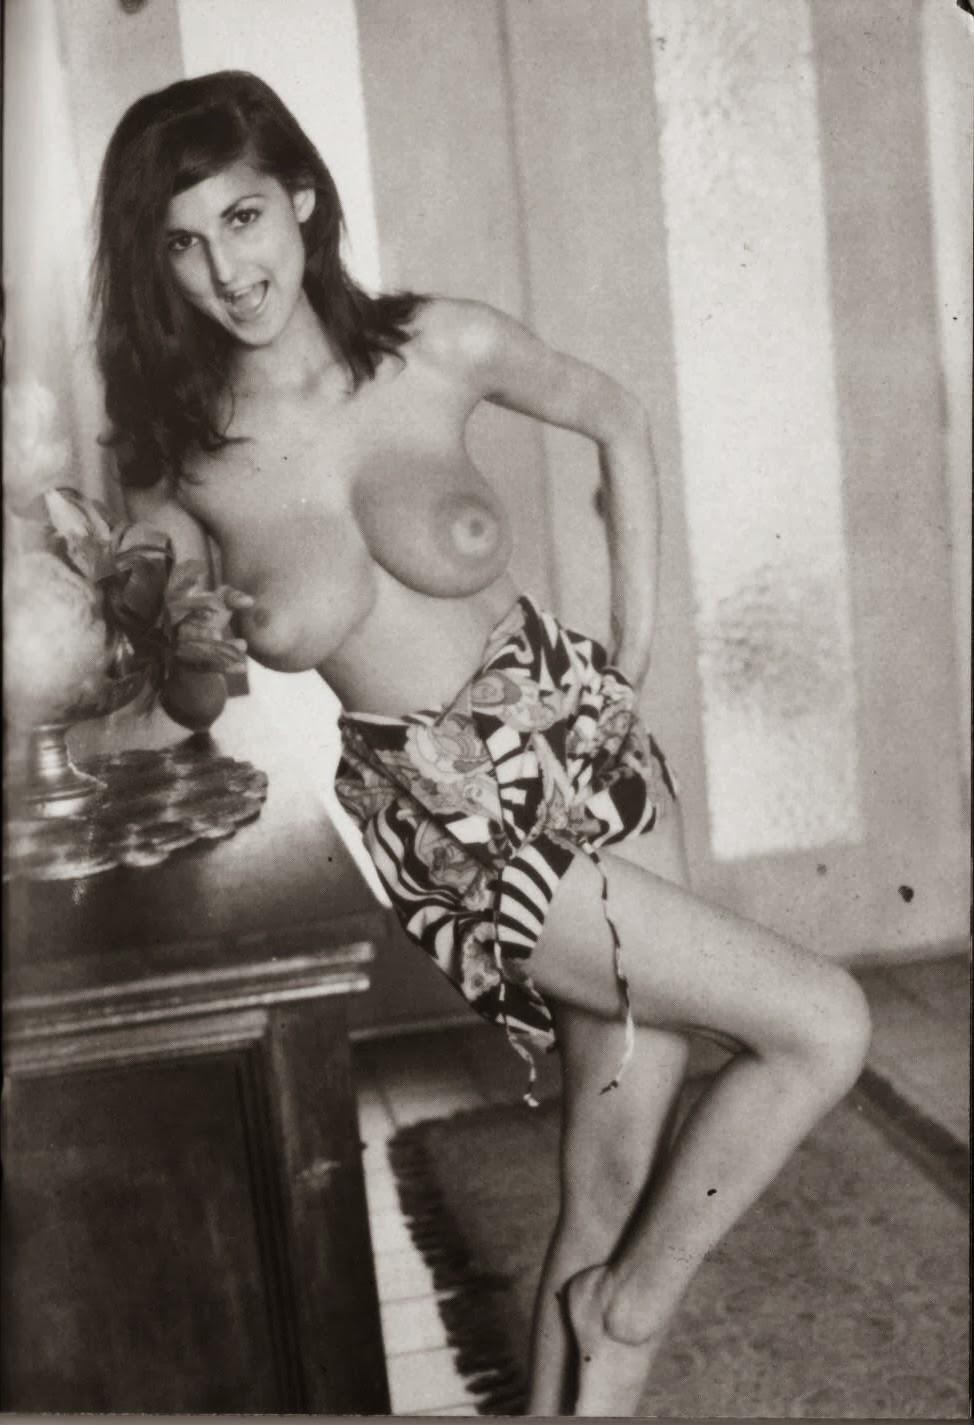 1970s Boots Porn - 1970s boots porn - Wonderland lillian parker jpg 974x1425